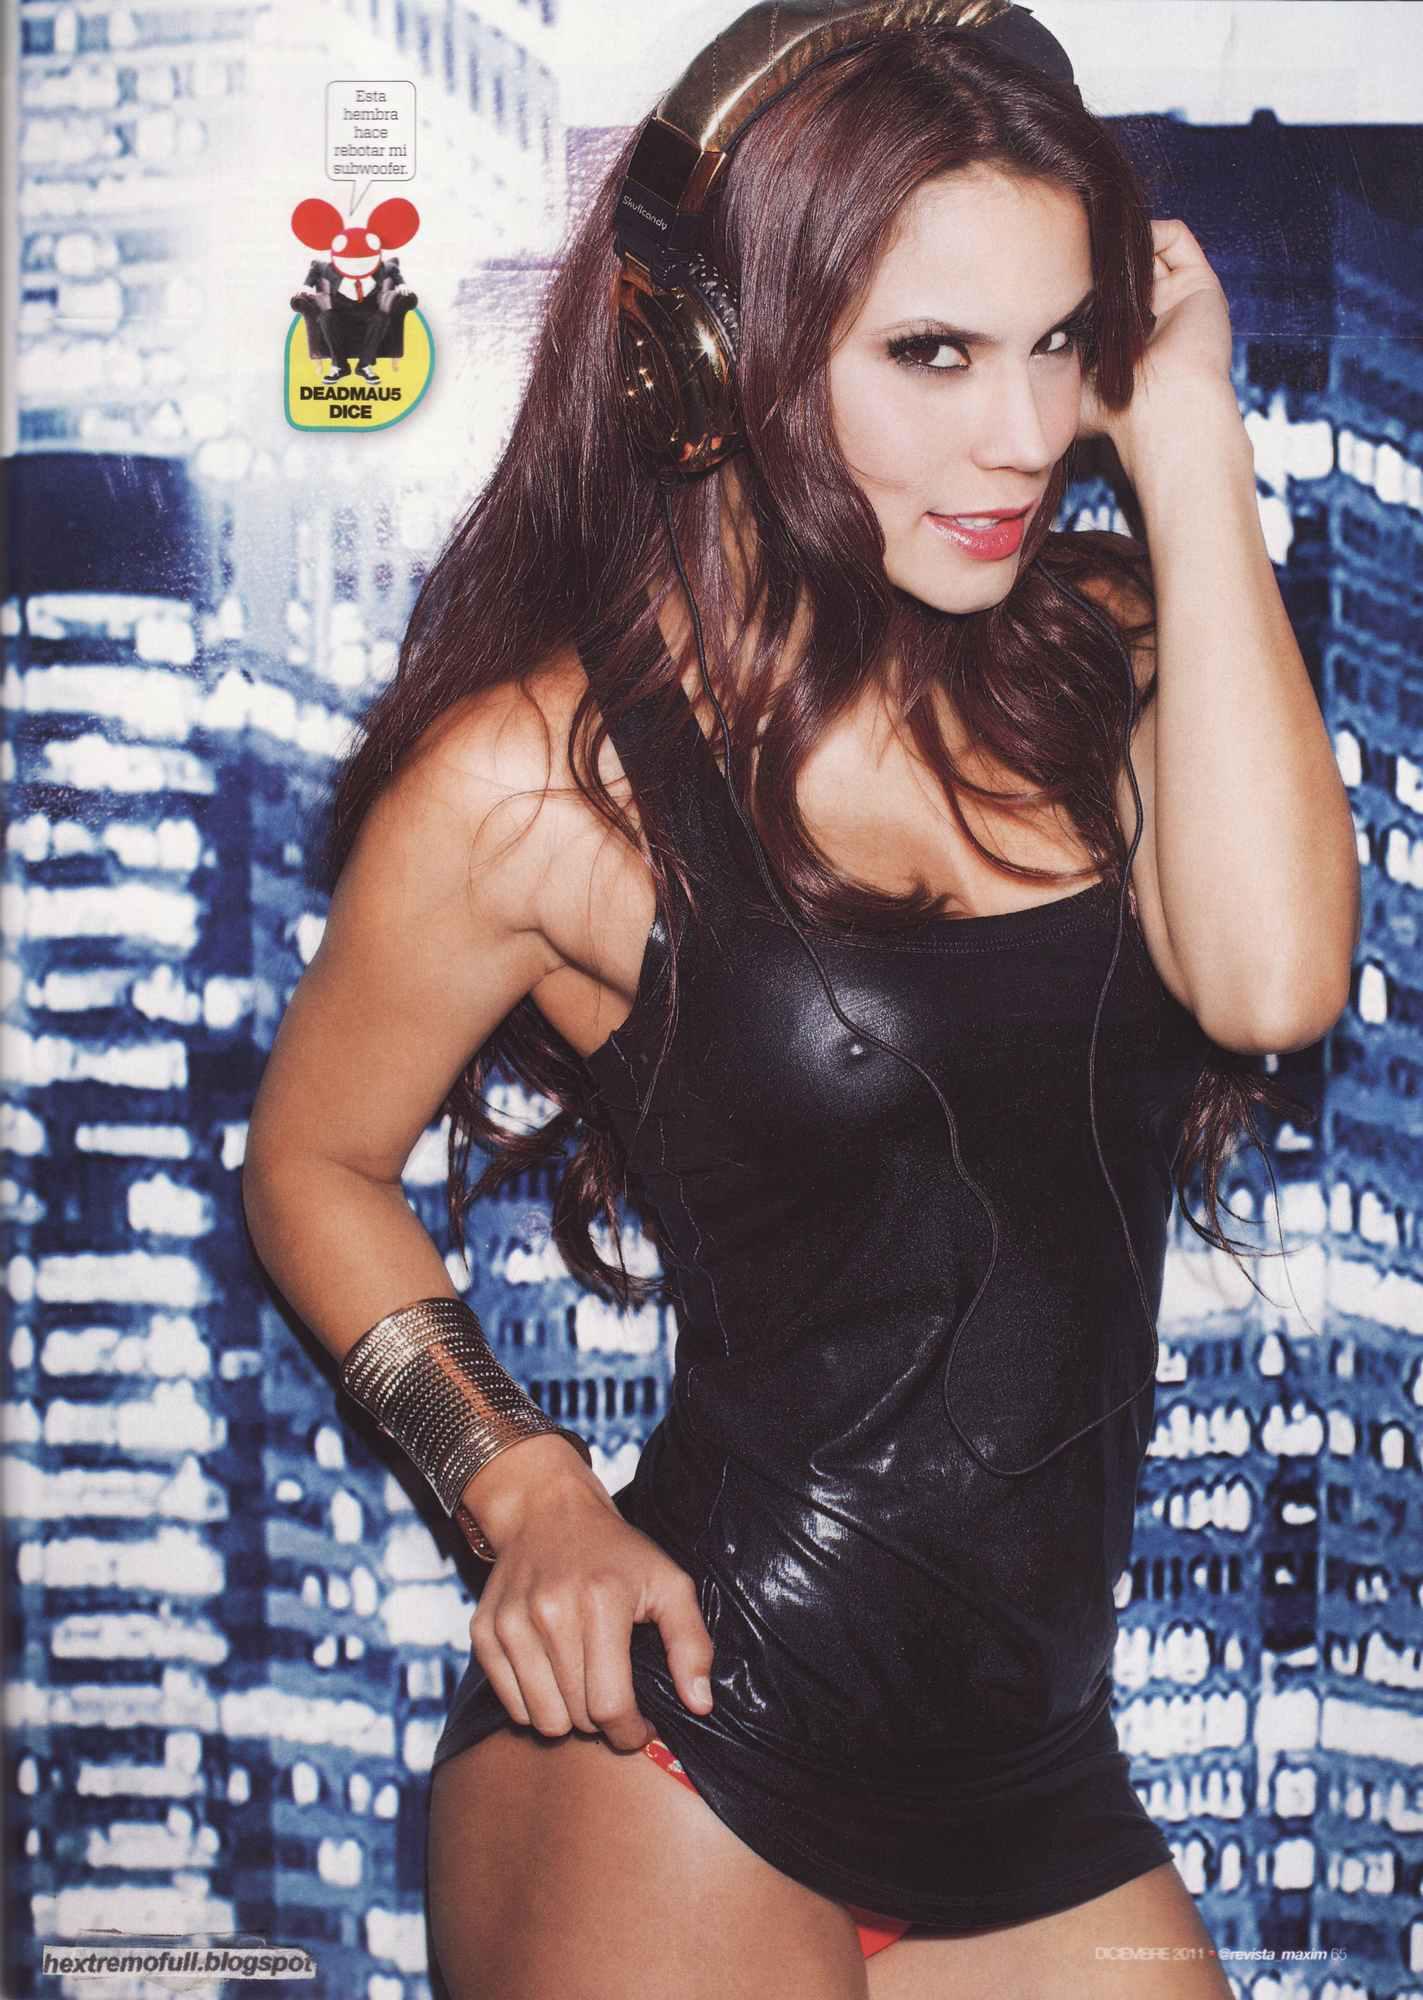 Andrea Rincón Naked andrea rincon naked pictures - big natural porn star